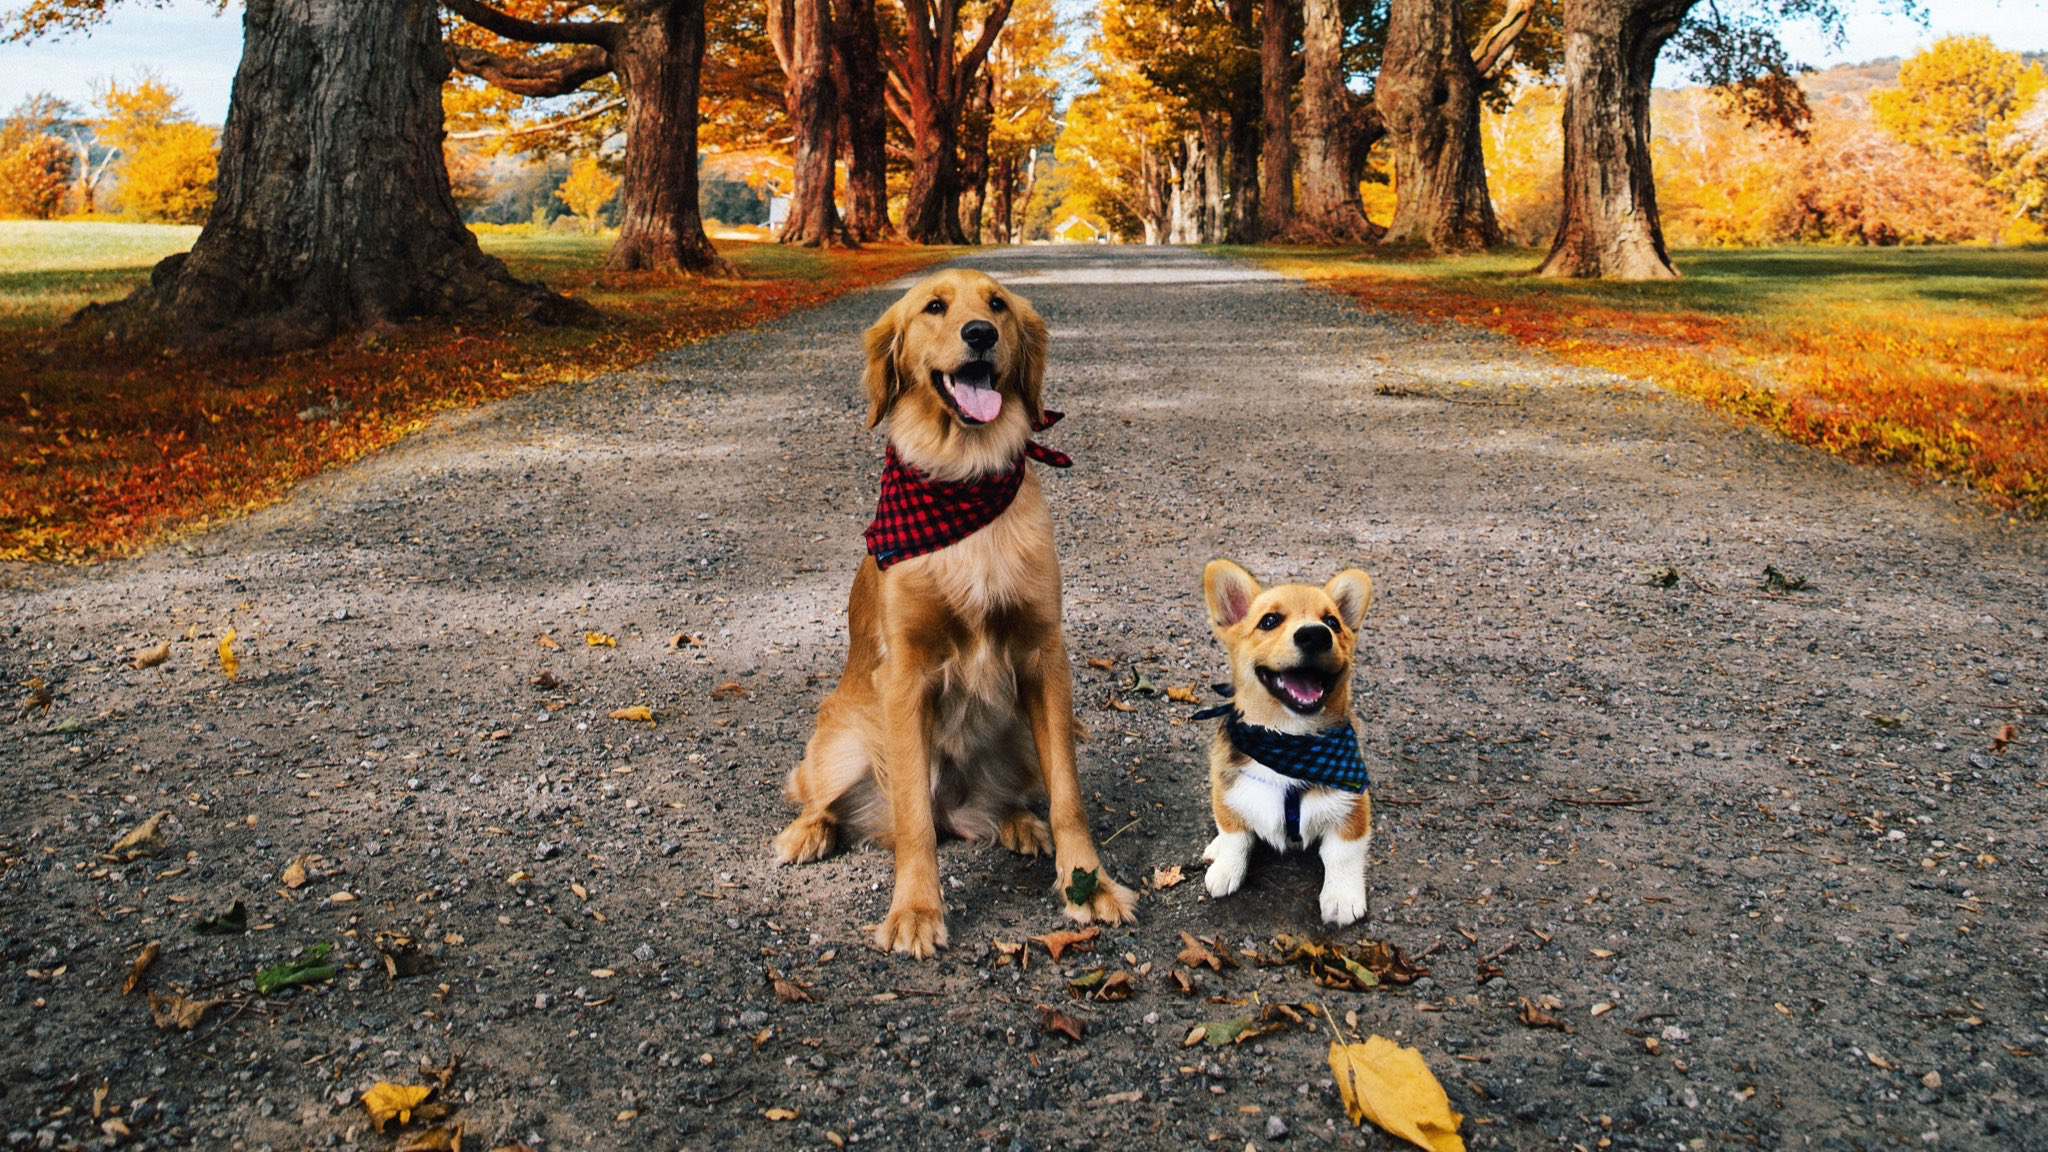 KJP pups Bennie and Apollo Pup, Dogs, Animals